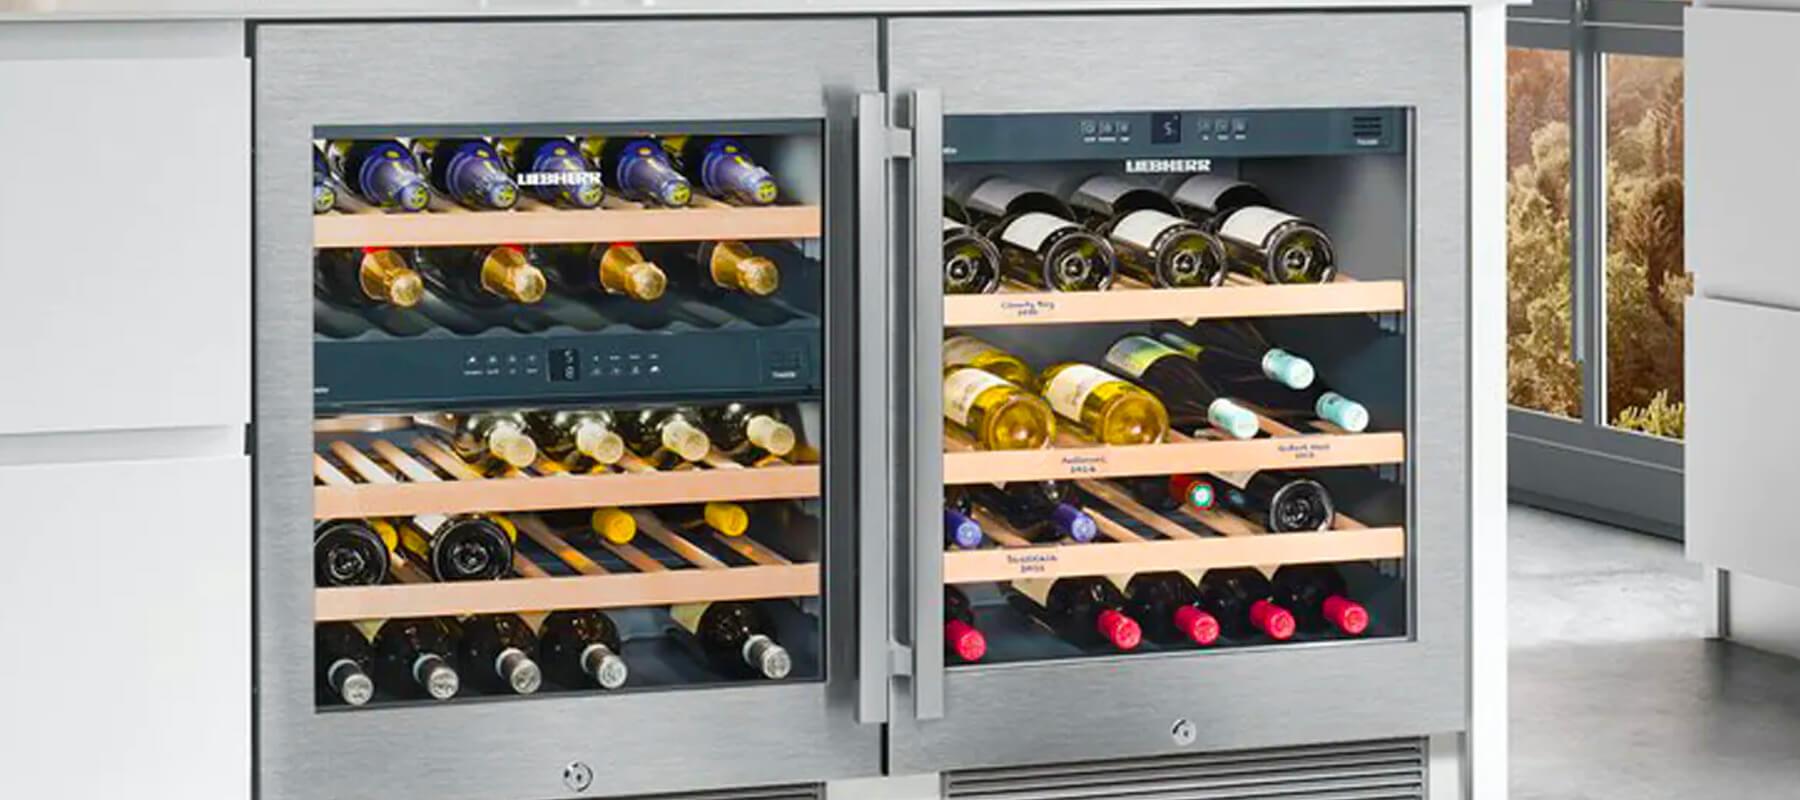 Built in Wine Refrigerator Undercounter Mission Viejo | Built-in Refrigerator Repair